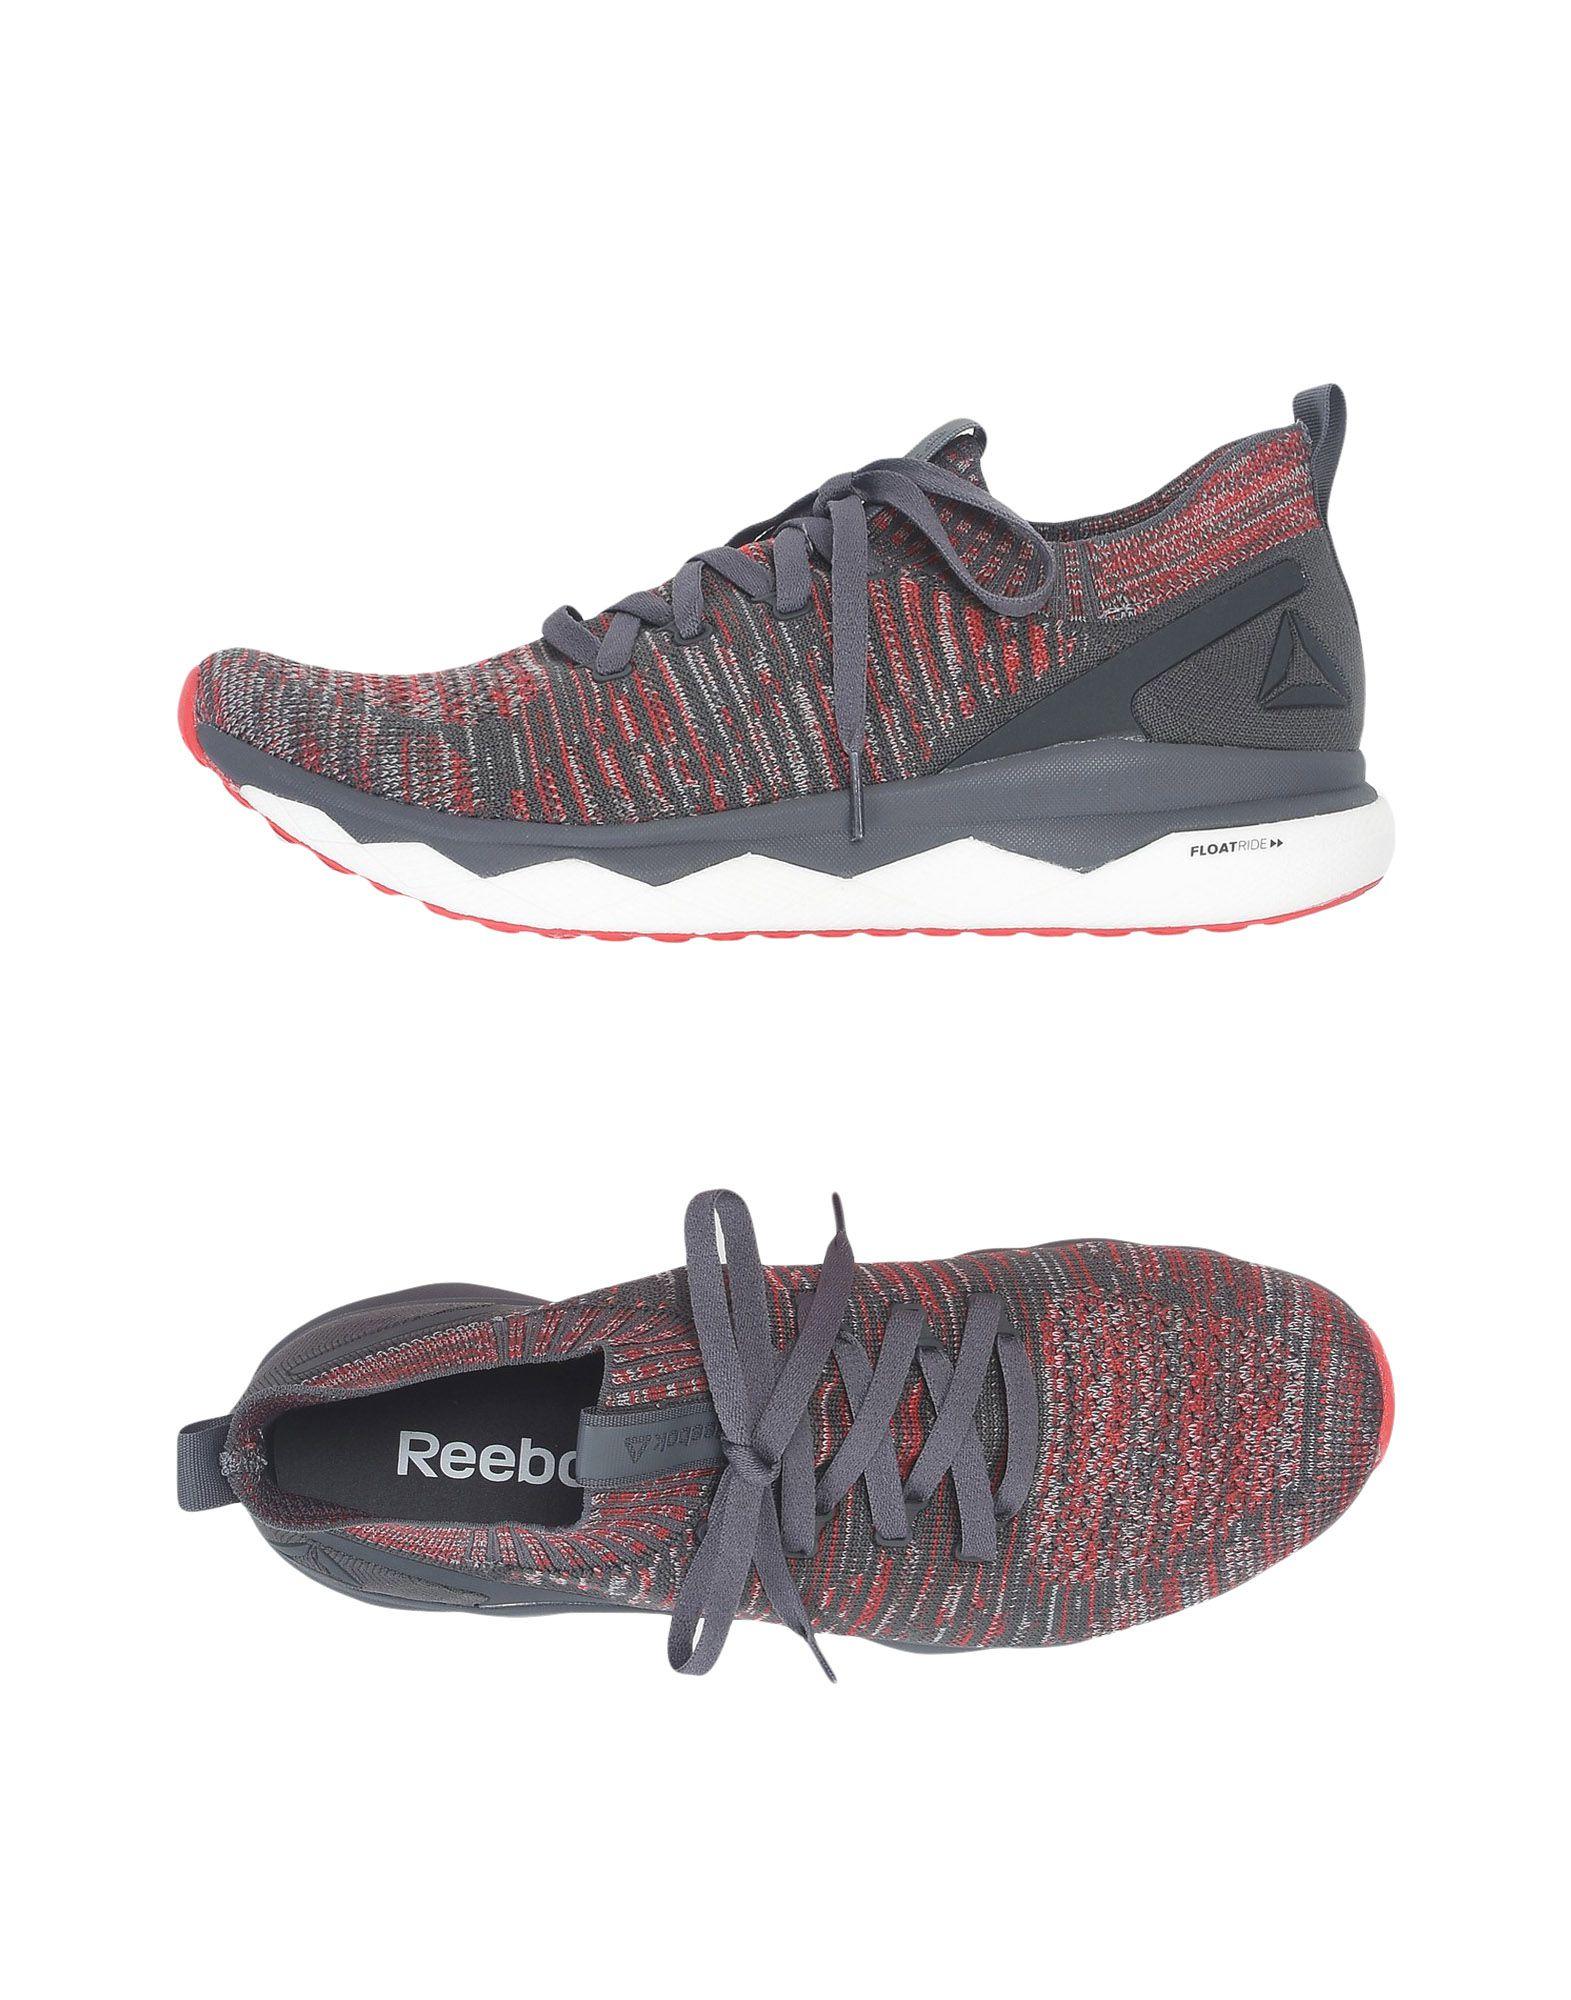 Sneakers Reebok Floatride Rs Ultk - Uomo - 11495304AI